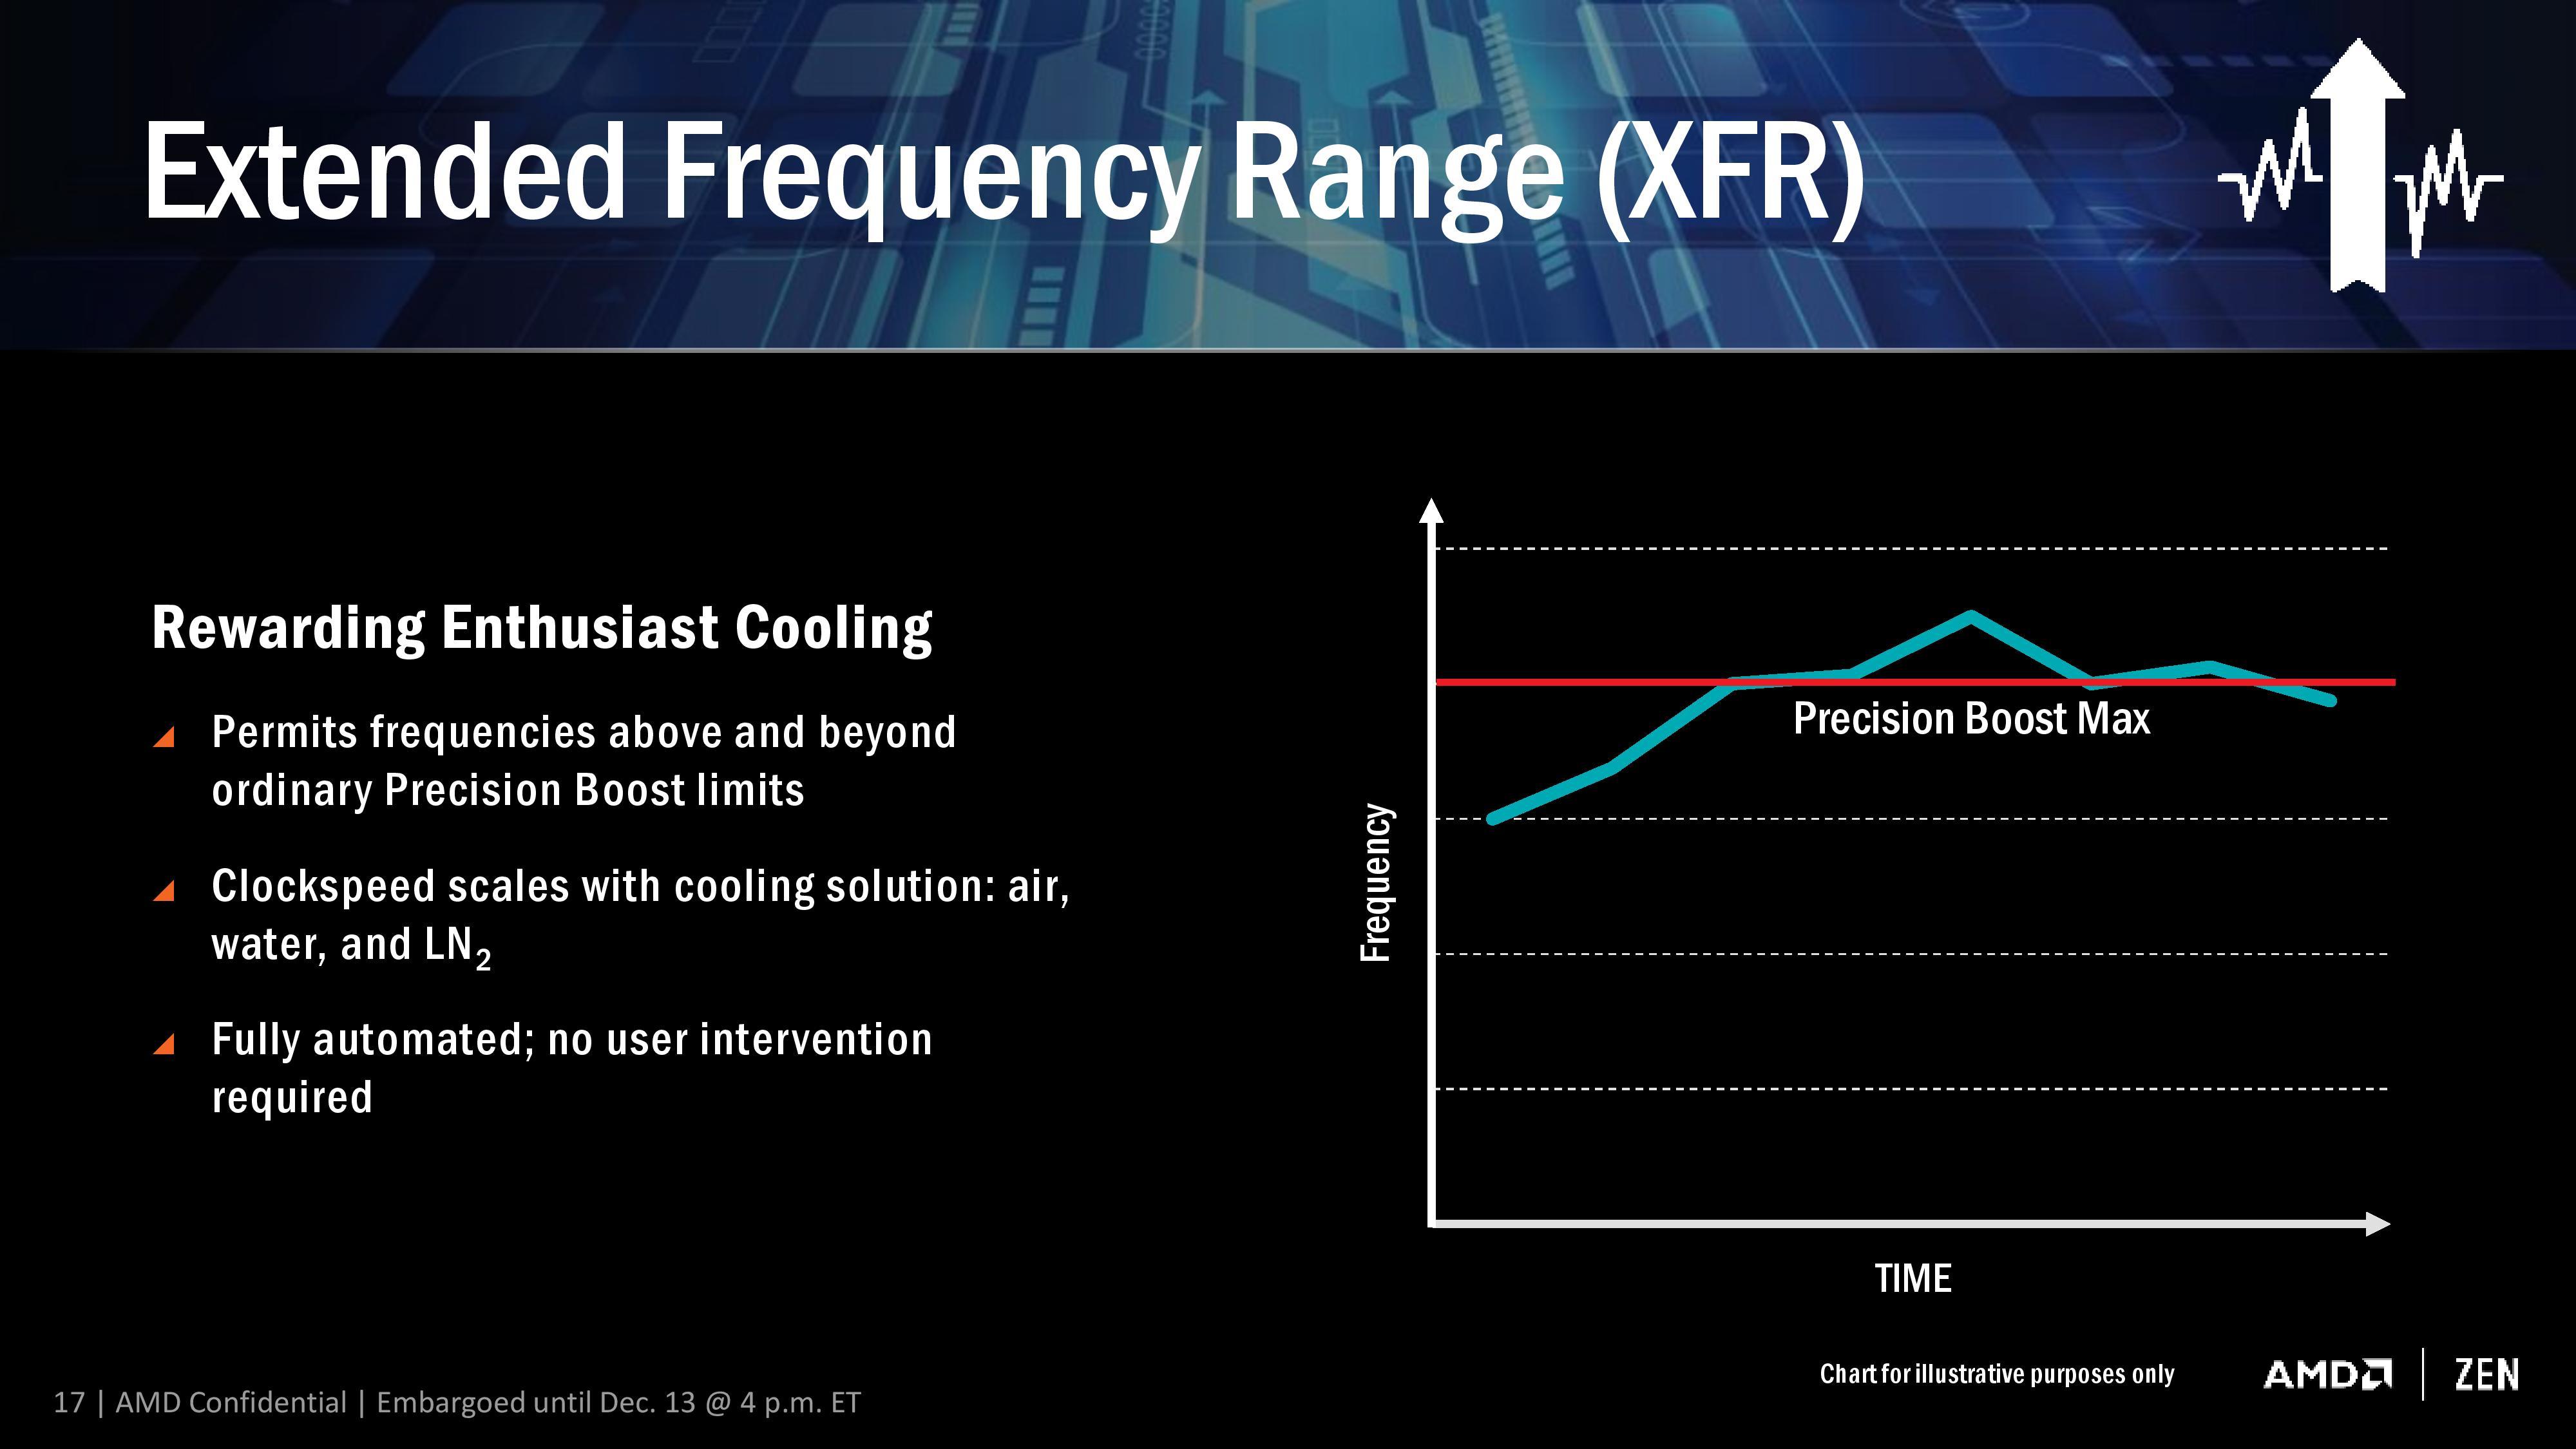 AMD Ryzen 7 1700 Specs Confirmed, A $320 Rival To Intel's $1099 i7